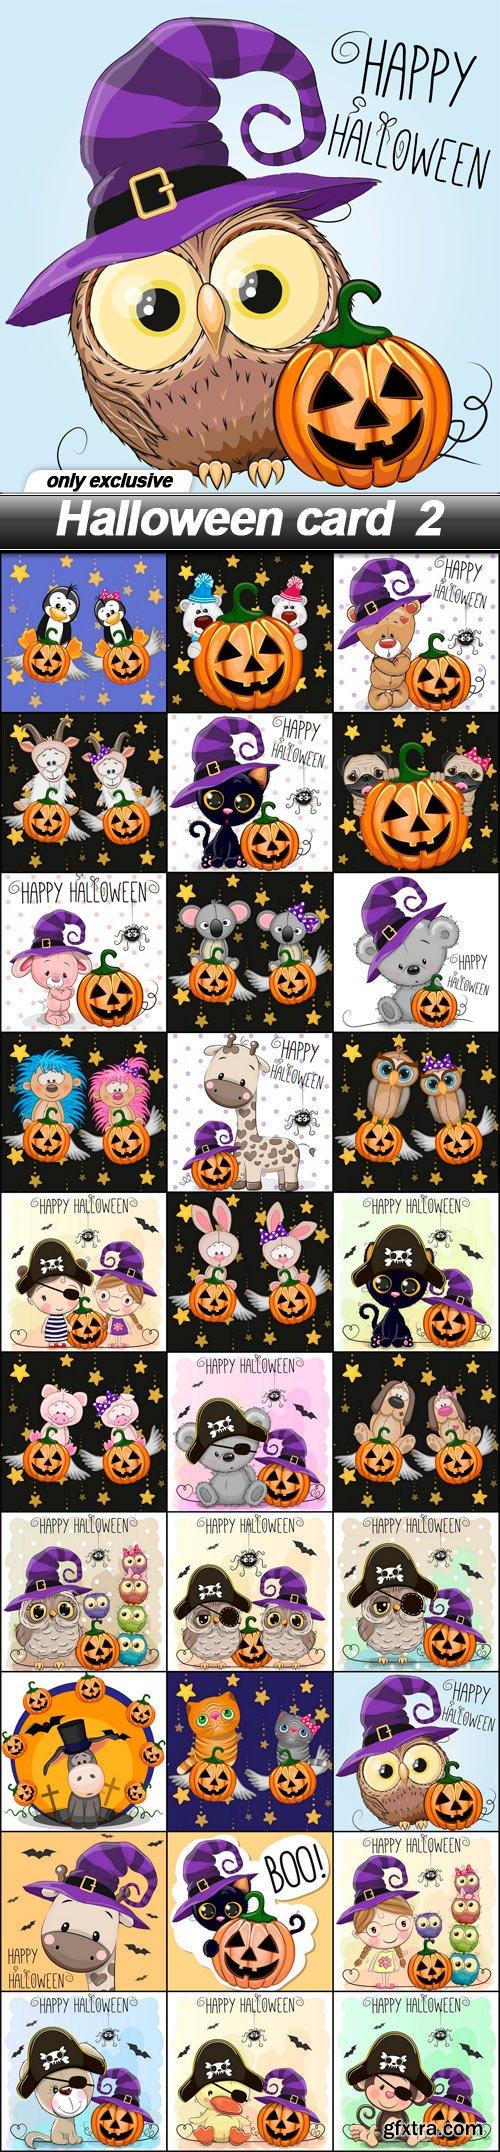 Halloween card 2 - 30 EPS